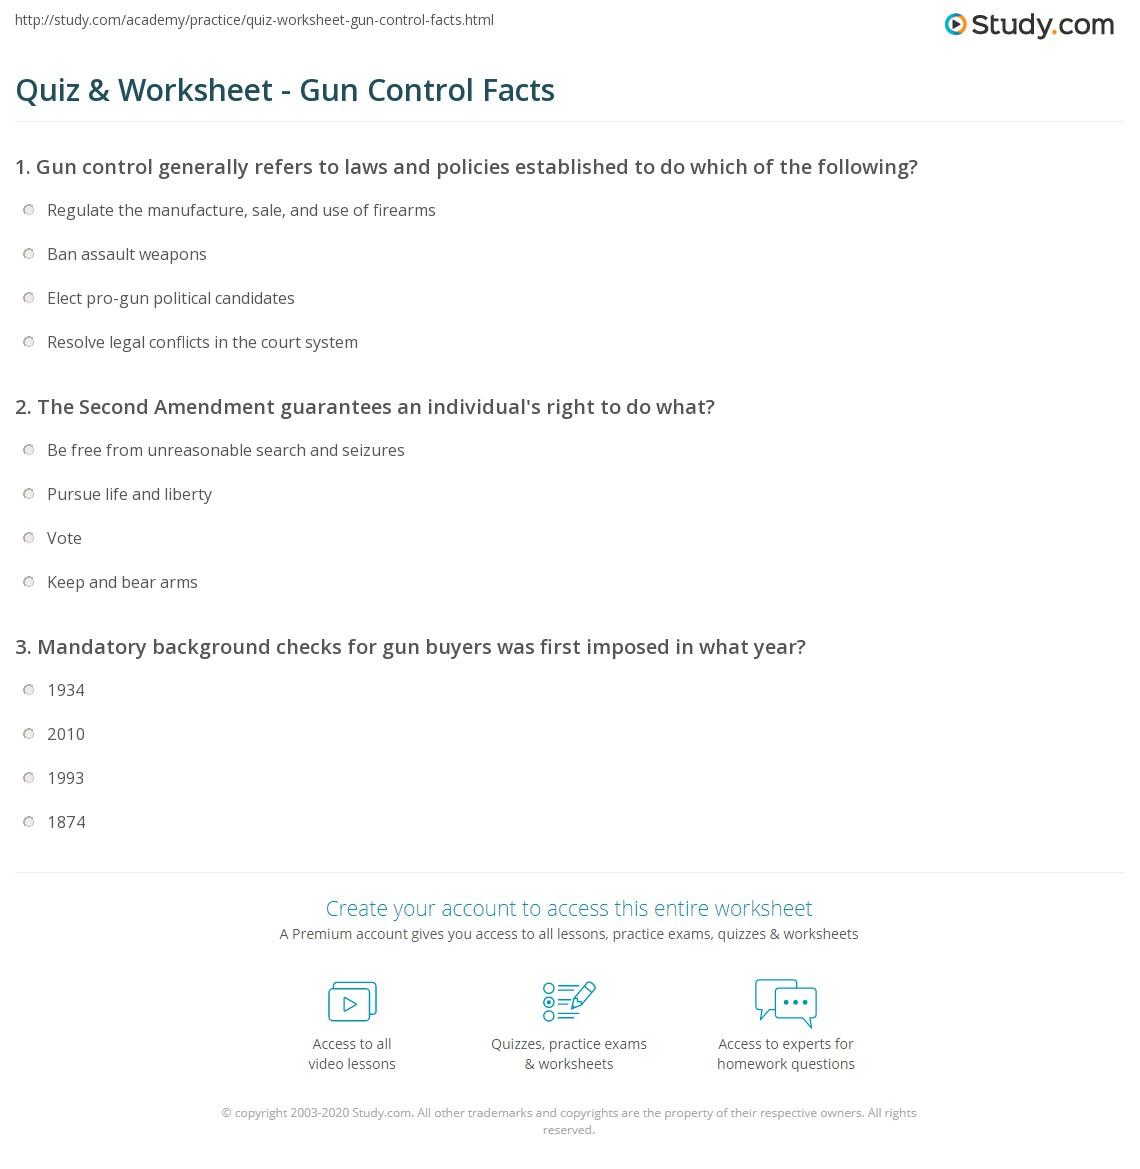 quiz worksheet gun control facts. Black Bedroom Furniture Sets. Home Design Ideas